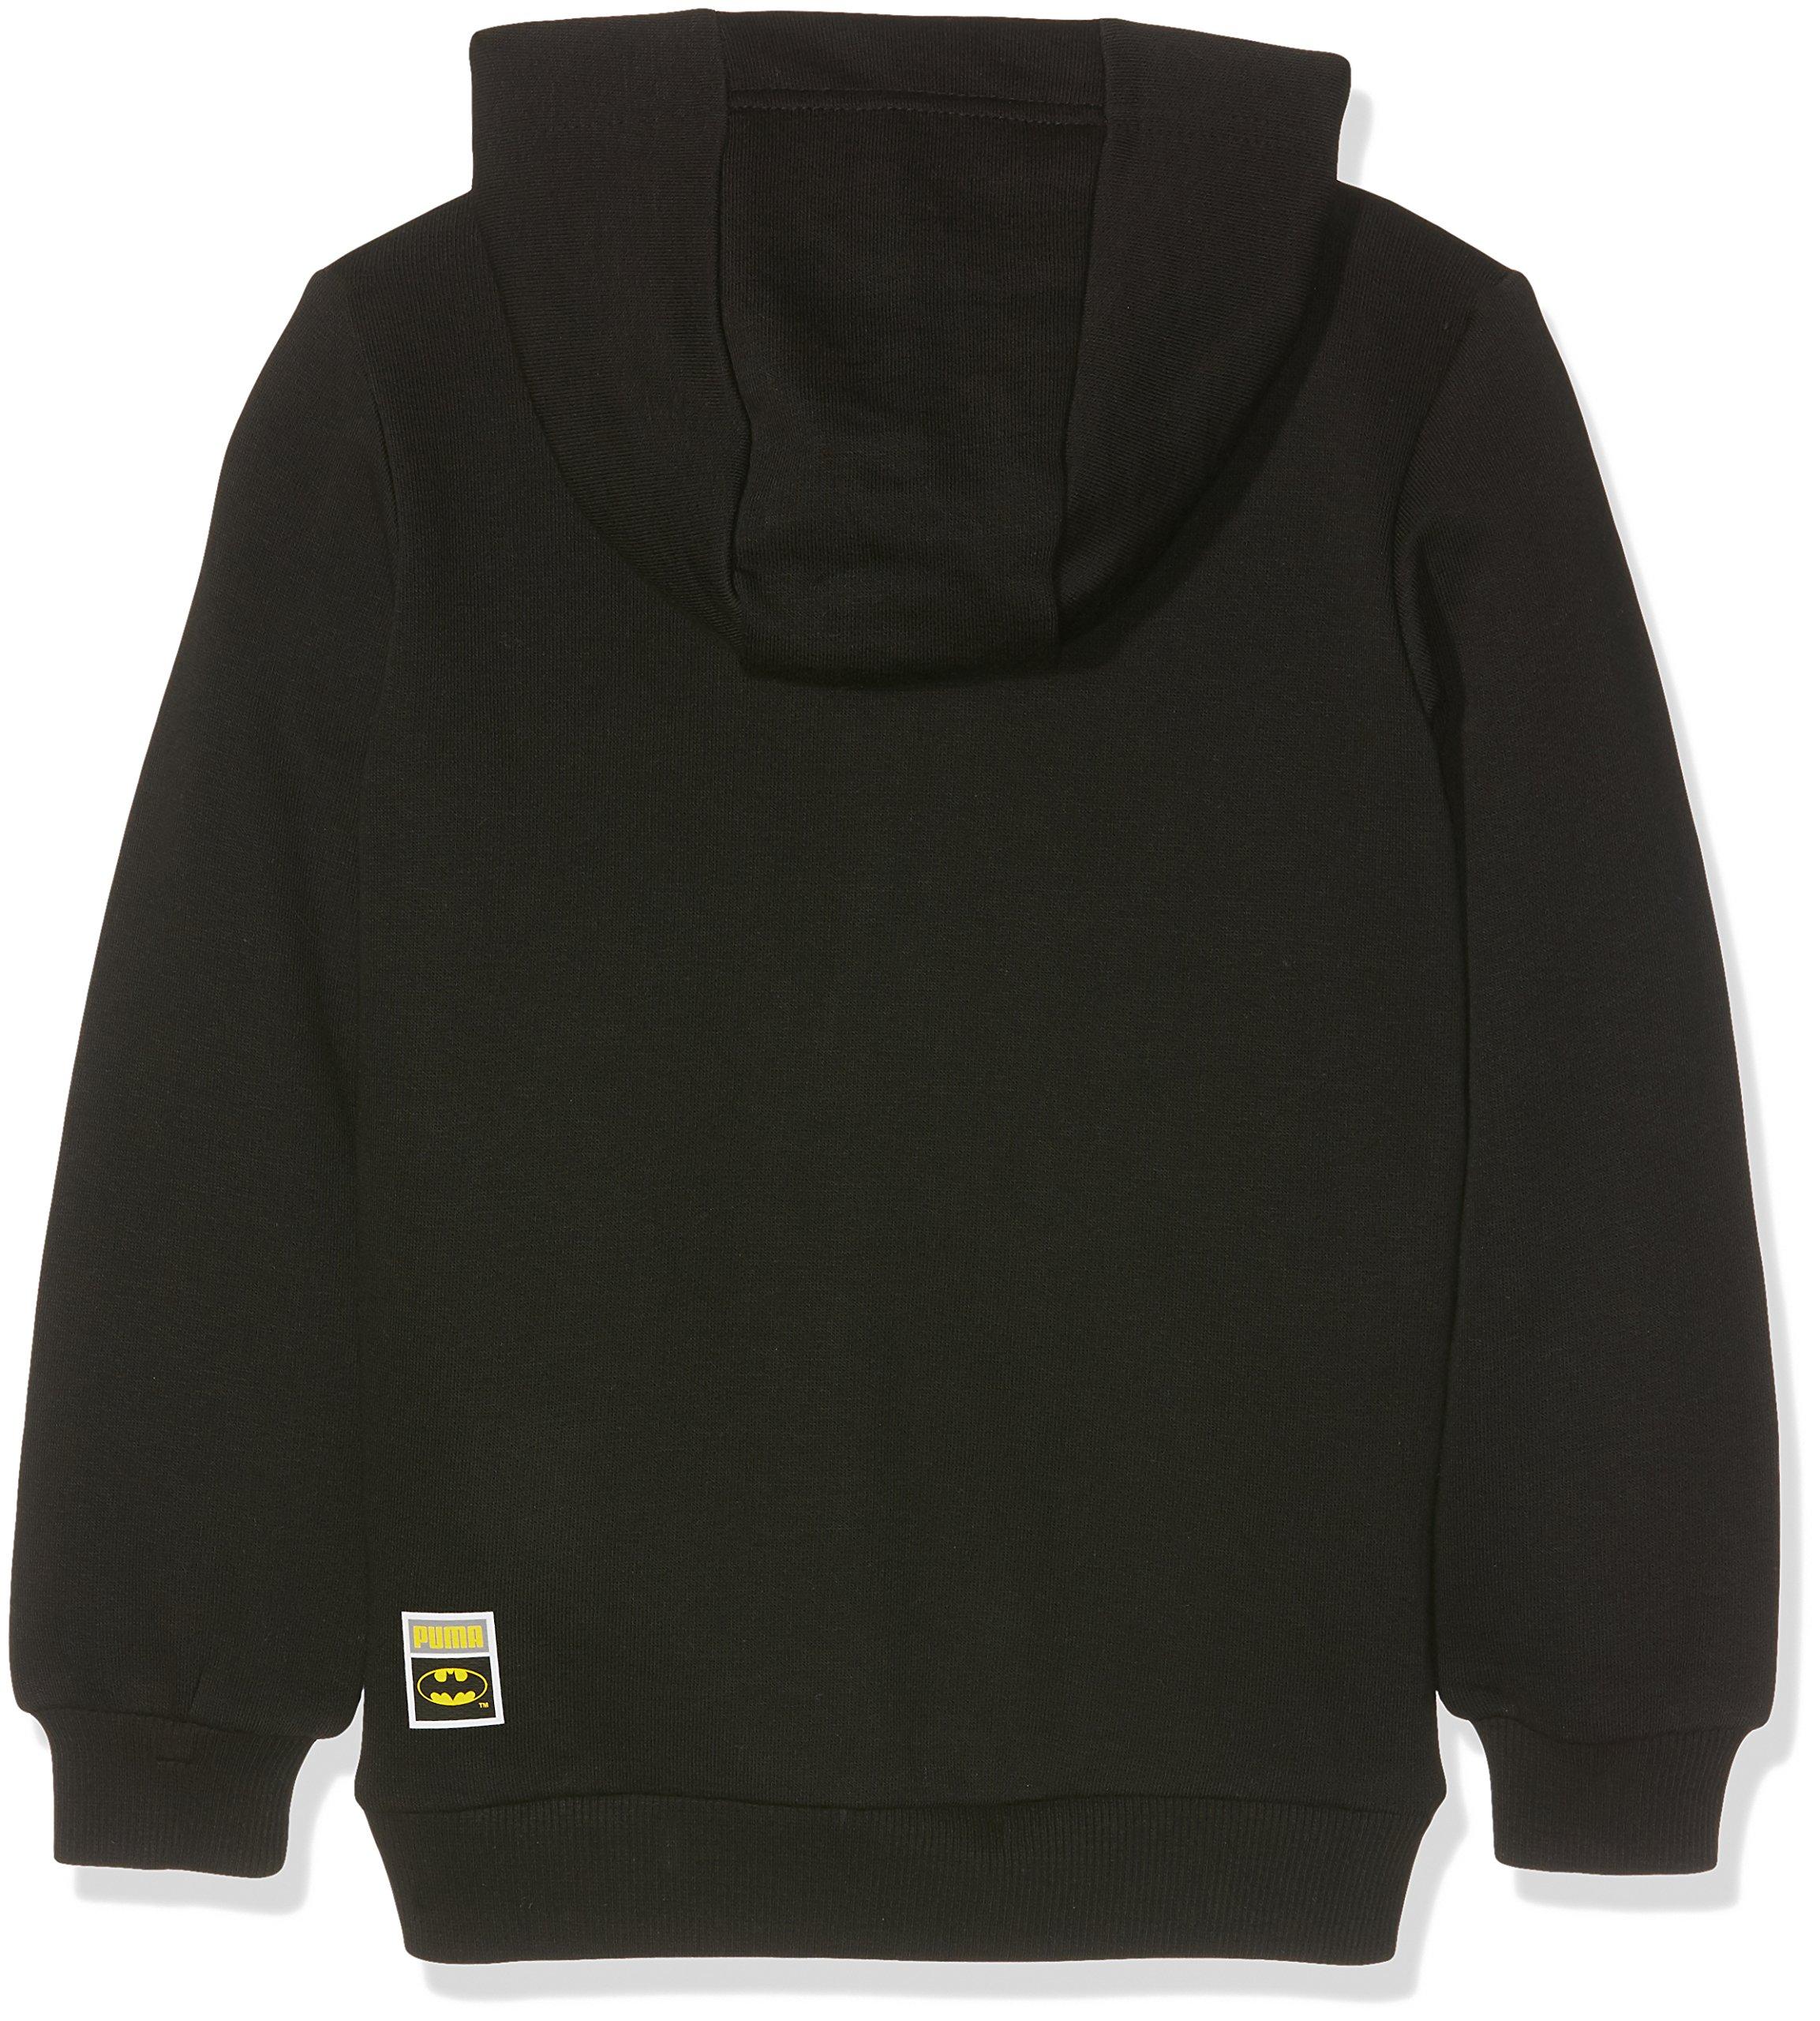 PUMA Kinder Style Batman Hooded Sweat Jacket Jacke Batman